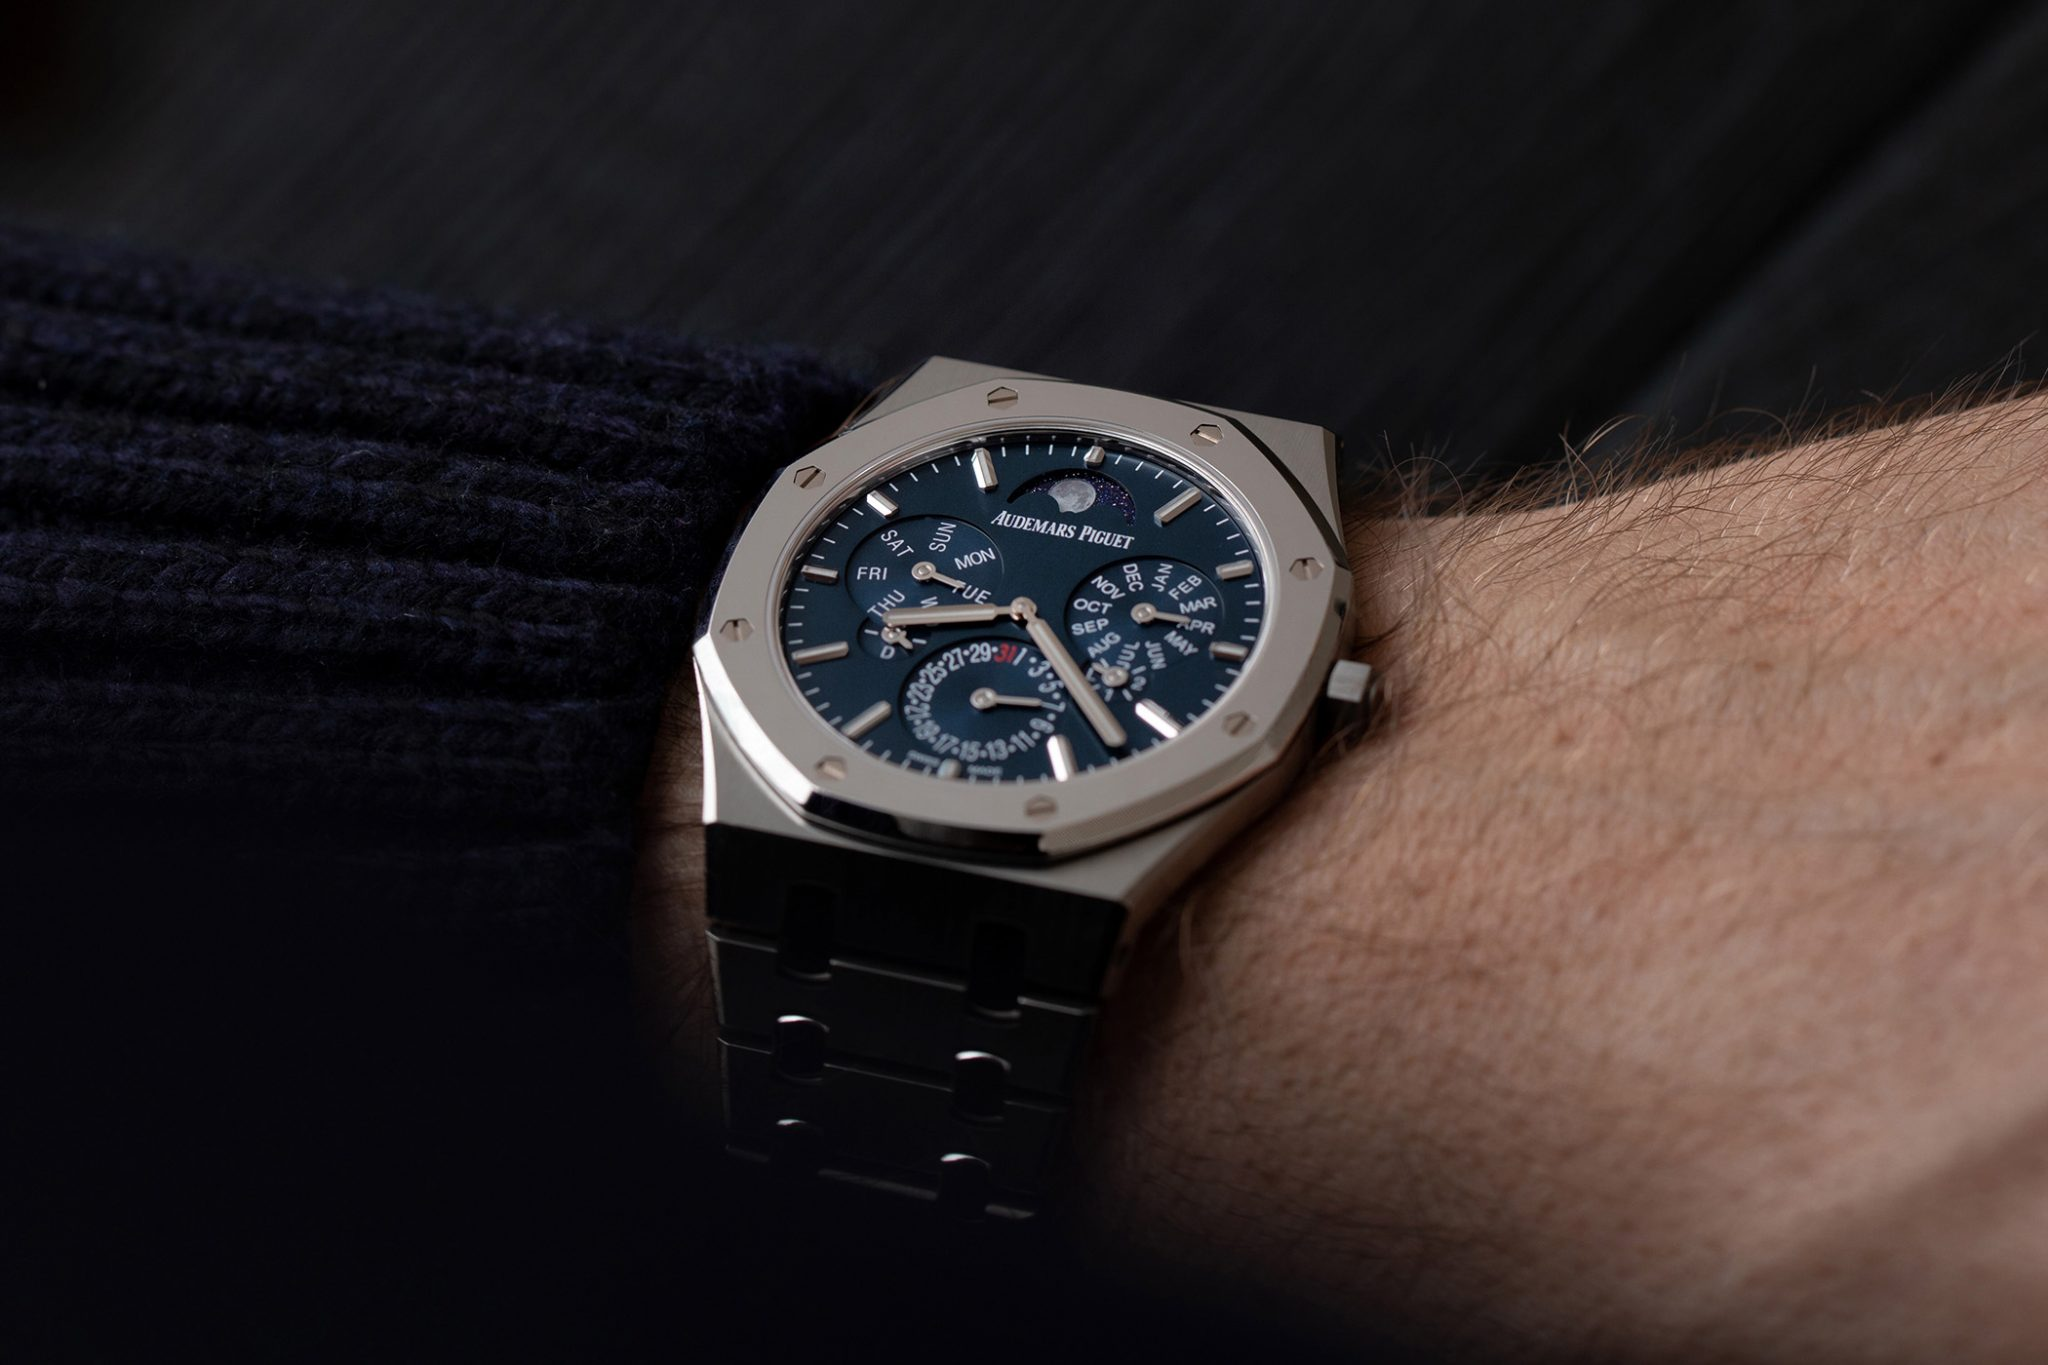 The Audemars Piguet Royal Oak Selfwinding Perpetual Calendar Ultra-Thin 26586IP.OO.1240IP.01 on the wrist